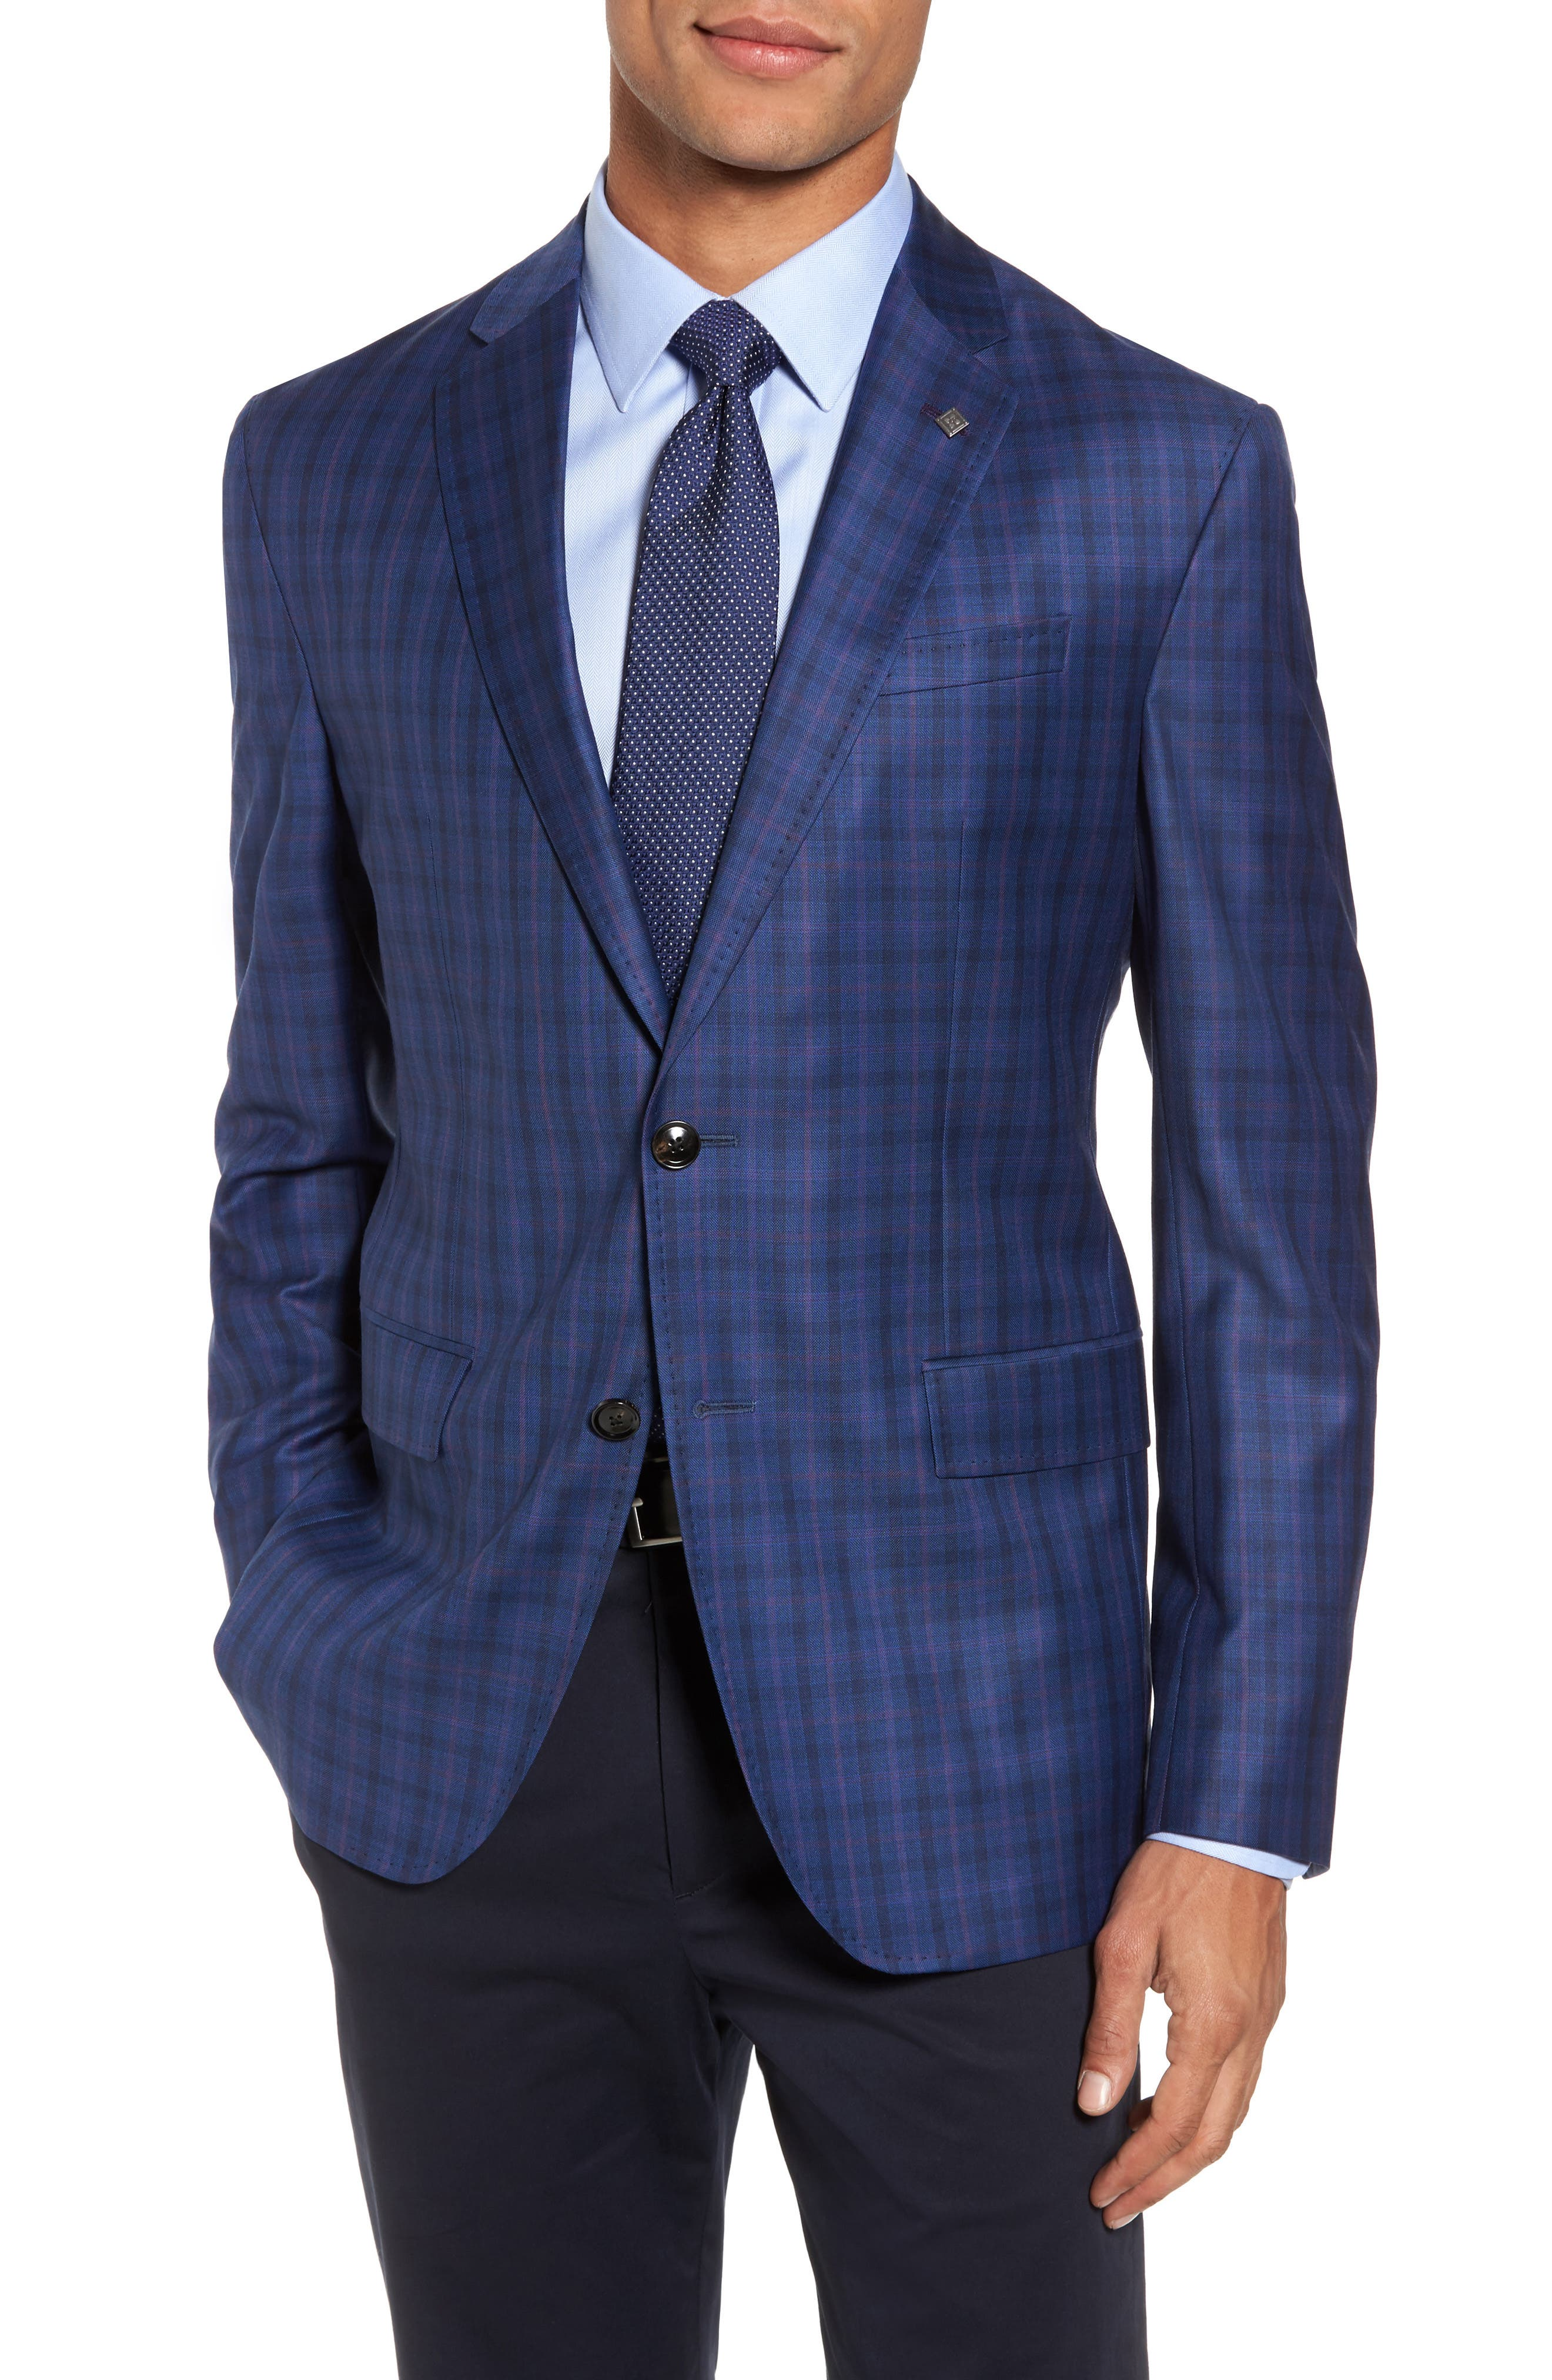 Konan Trim Fit Plaid Wool Sport Coat,                             Main thumbnail 1, color,                             Blue W/Light Berry Windowpane